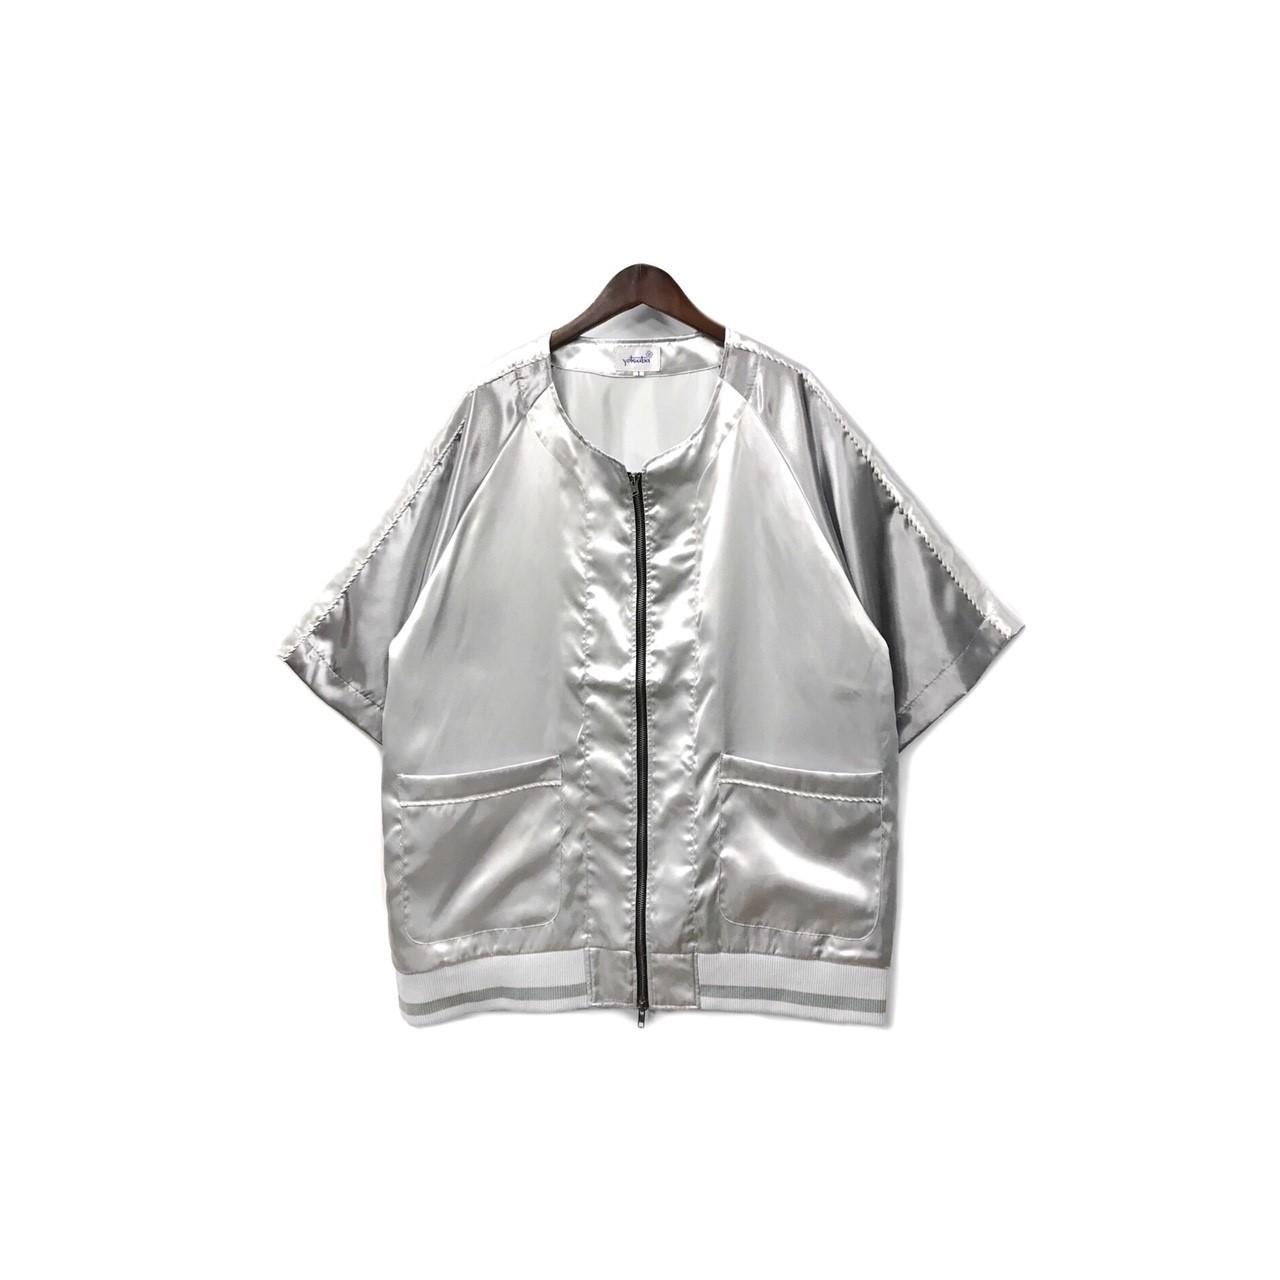 yotsuba - Souvenir baseball Shirt / Silver ¥26000+tax